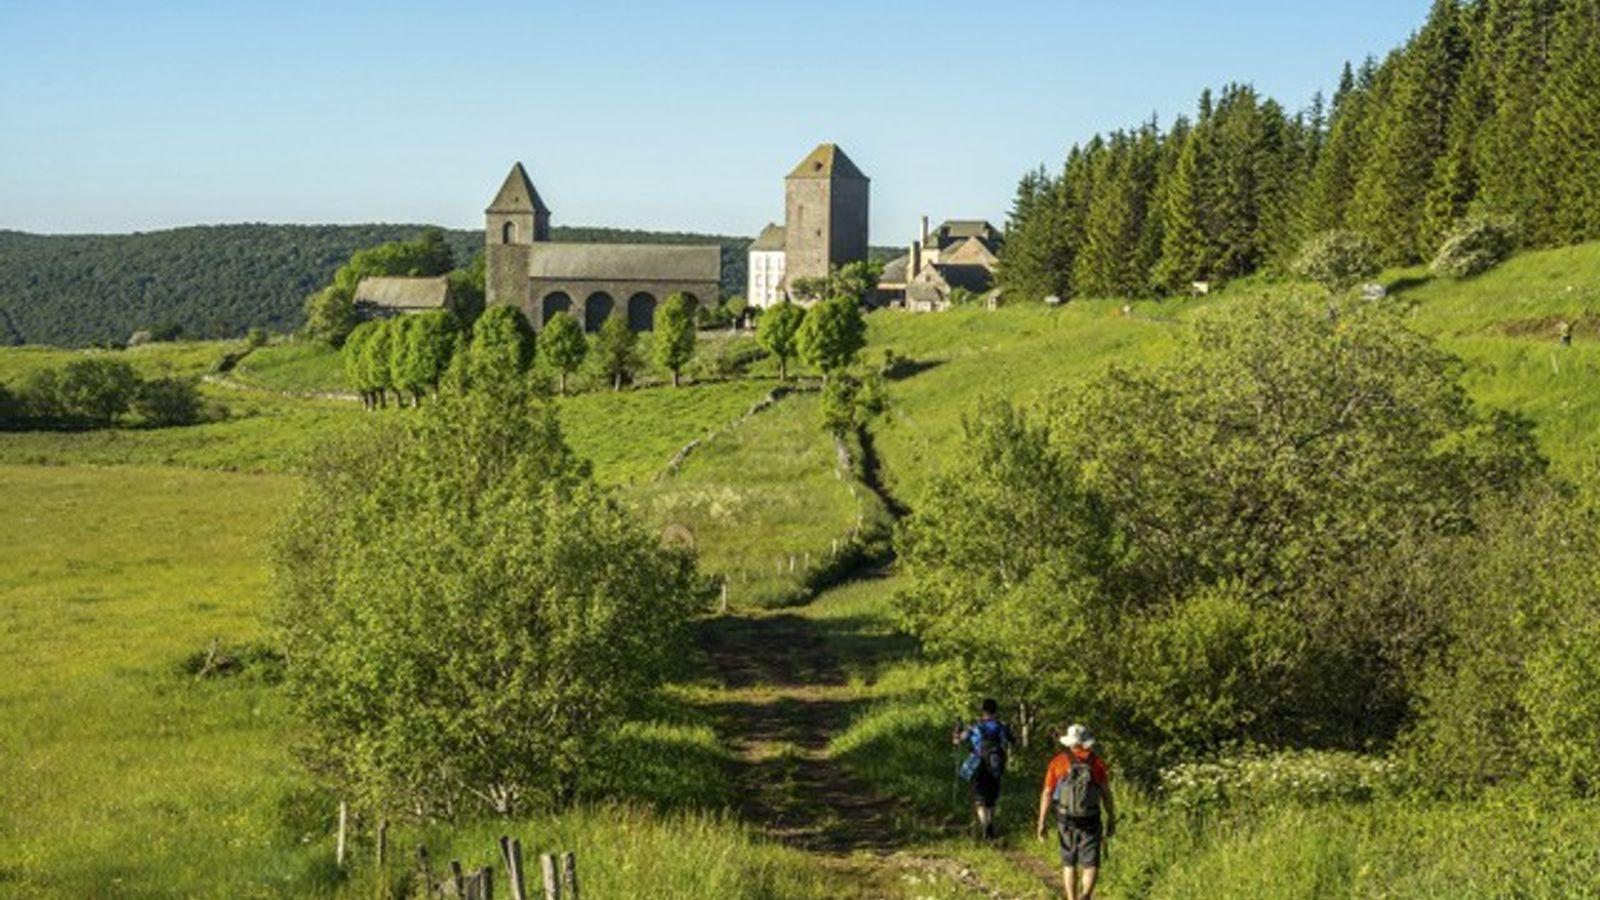 Aubrac village on the Via Podiensis, St James's Way